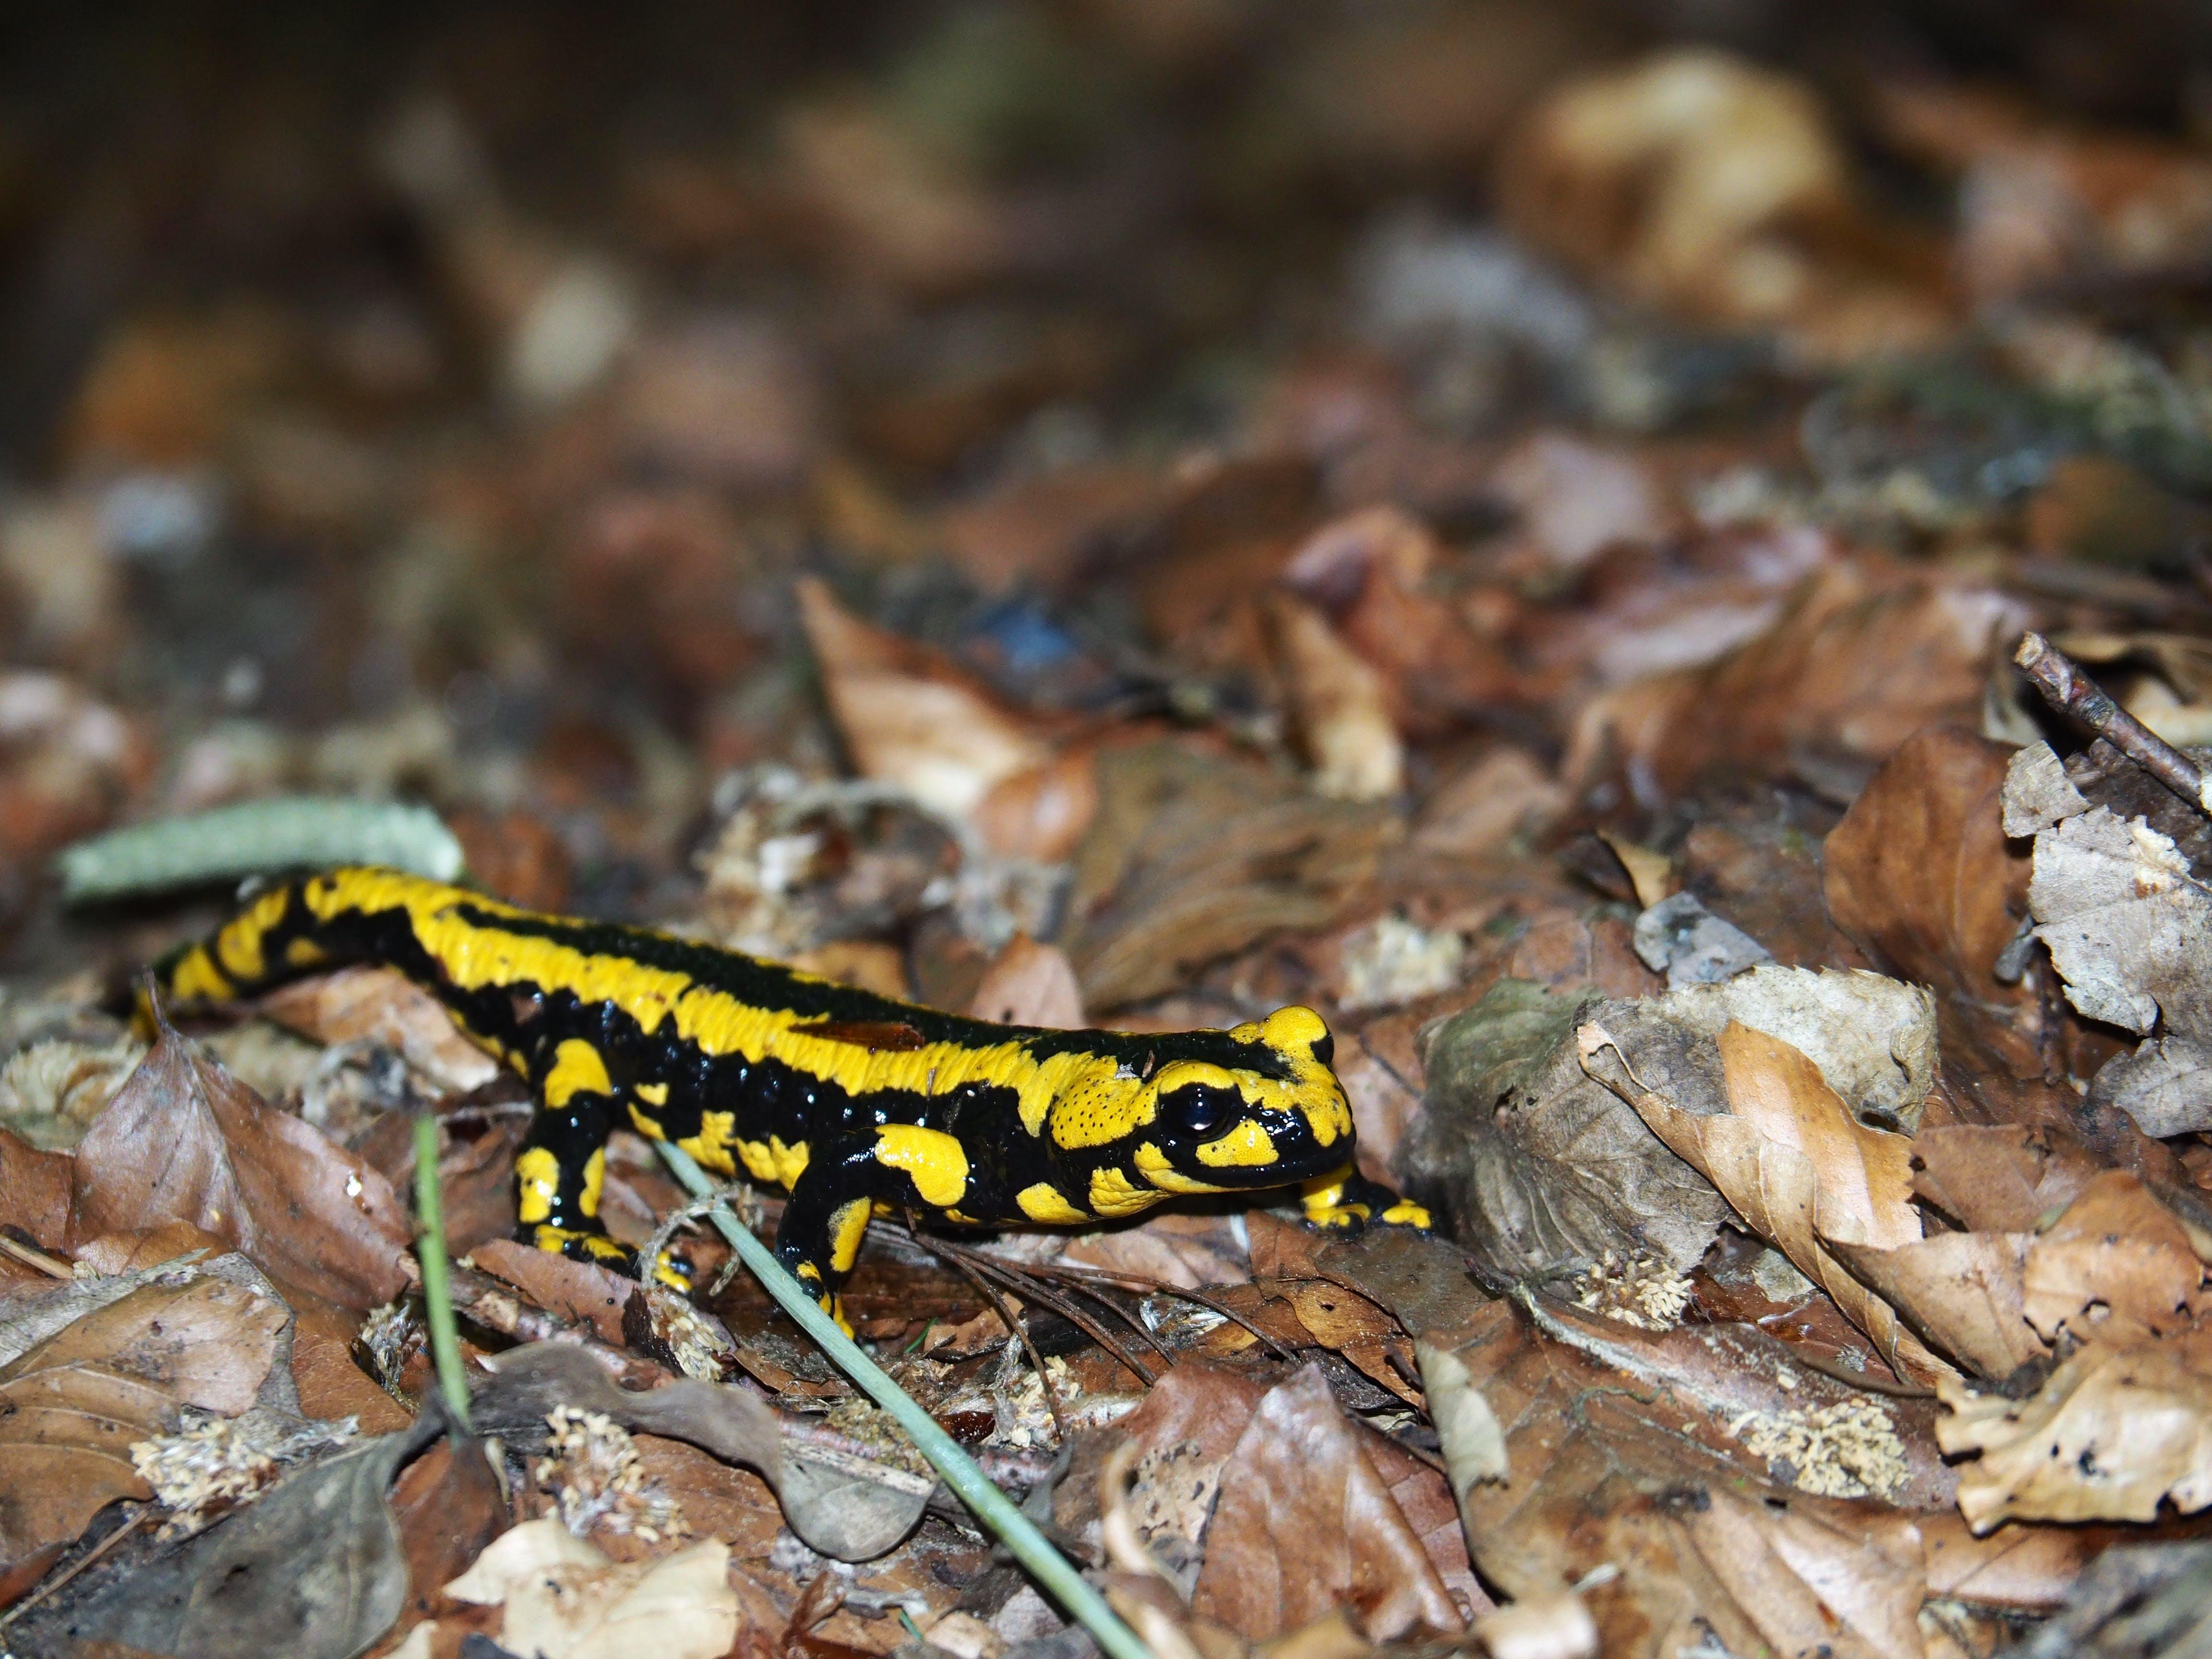 Black and Yellow Lizard